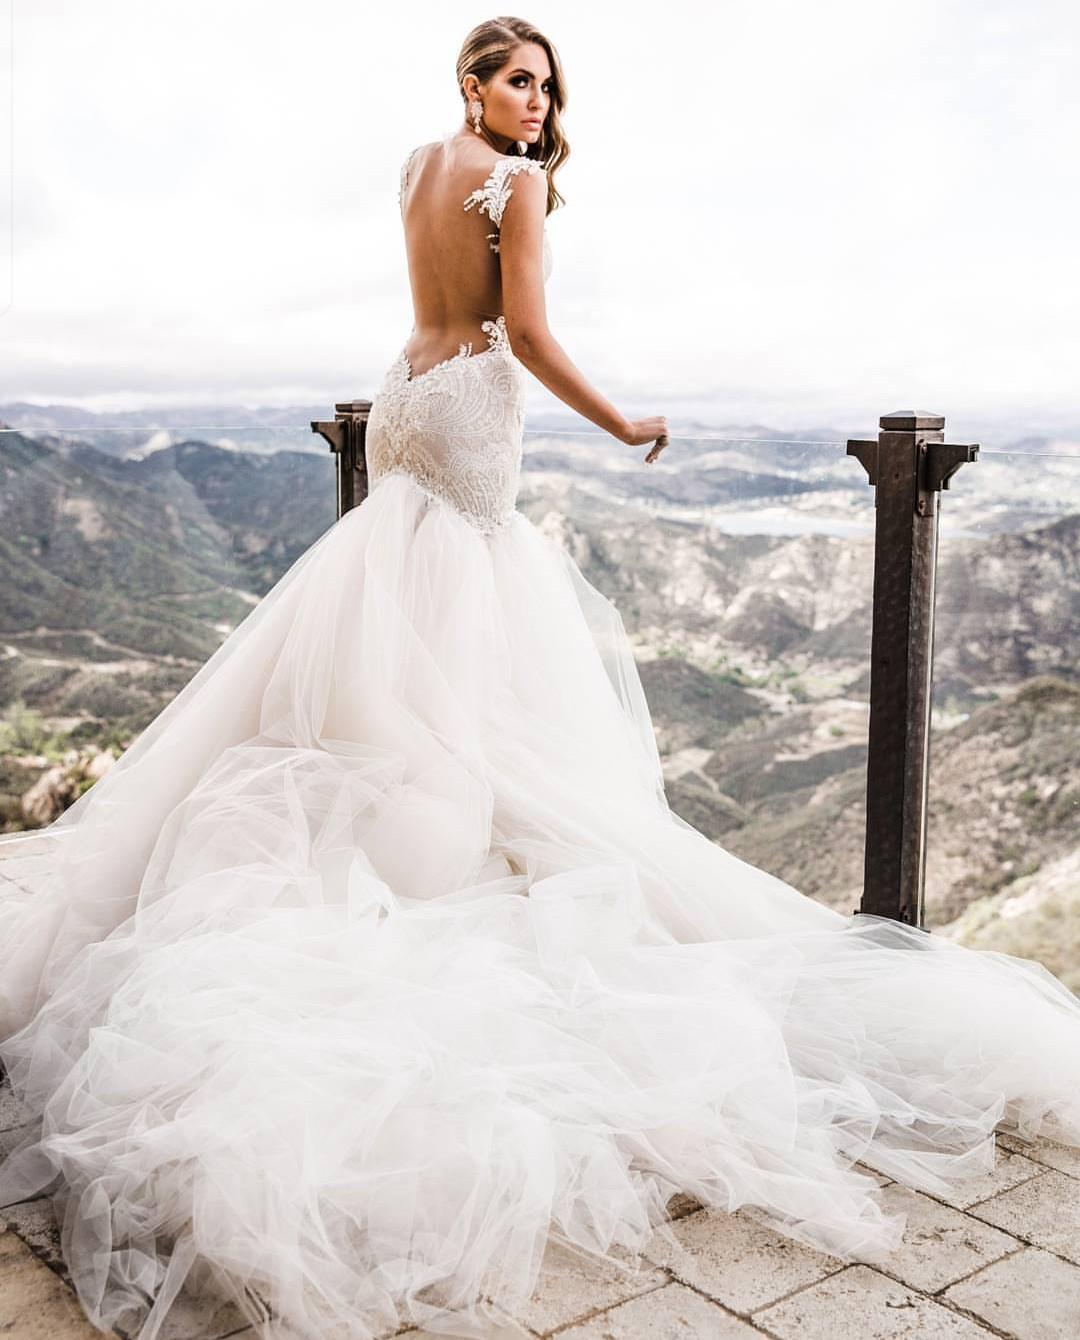 Galia lahav norma wedding dress on sale 68 off au9000 au16190 galia lahav size 8 junglespirit Images